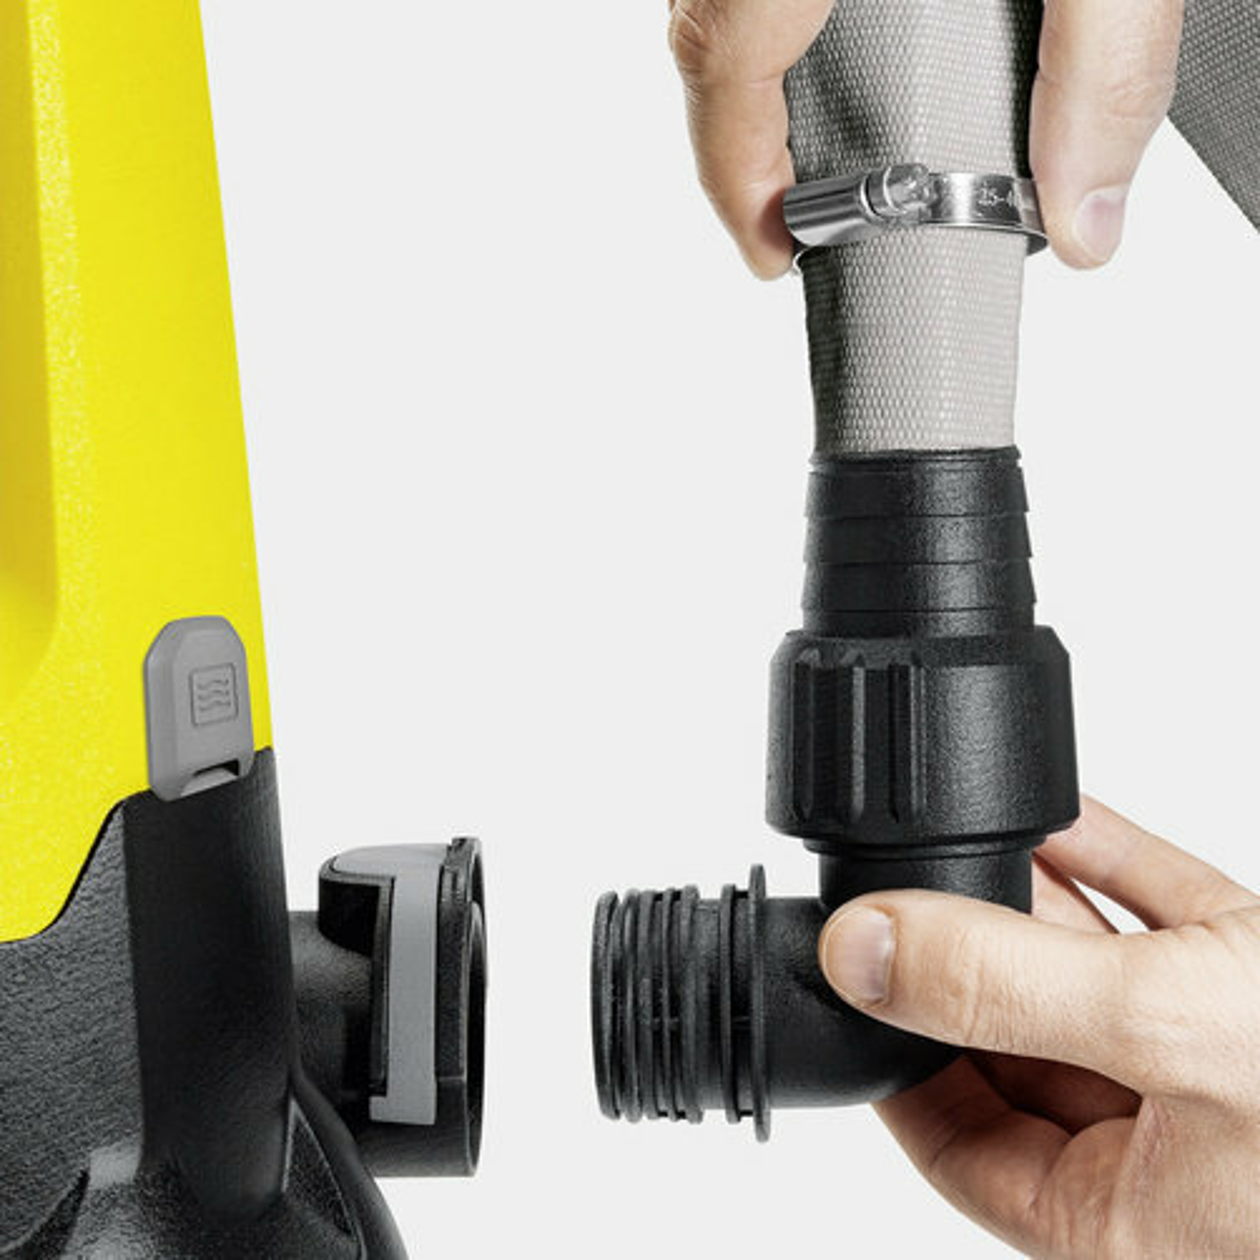 Ponorné kalové čerpadlo SP 7 Dirt Inox: Quick Connect